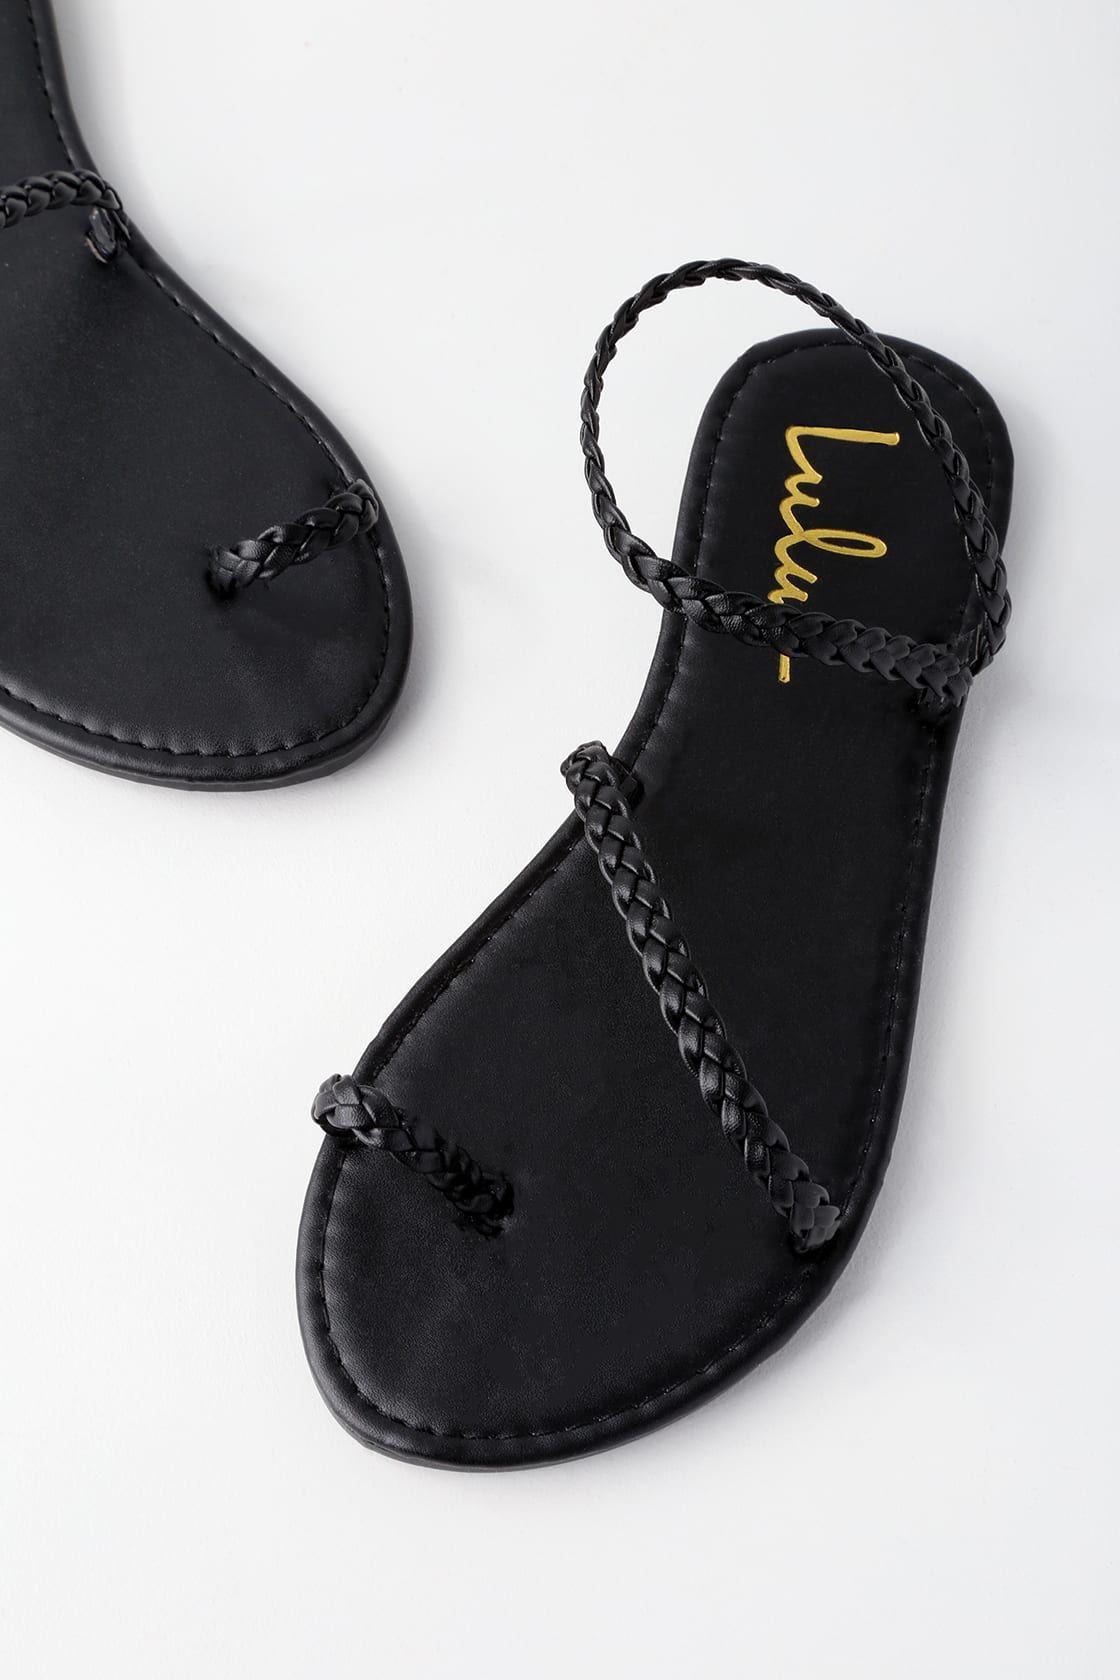 Mirela Black Flat Sandals In 2021 Black Sandals Flat Black Lace Up Flats Women Shoes [ 1680 x 1120 Pixel ]